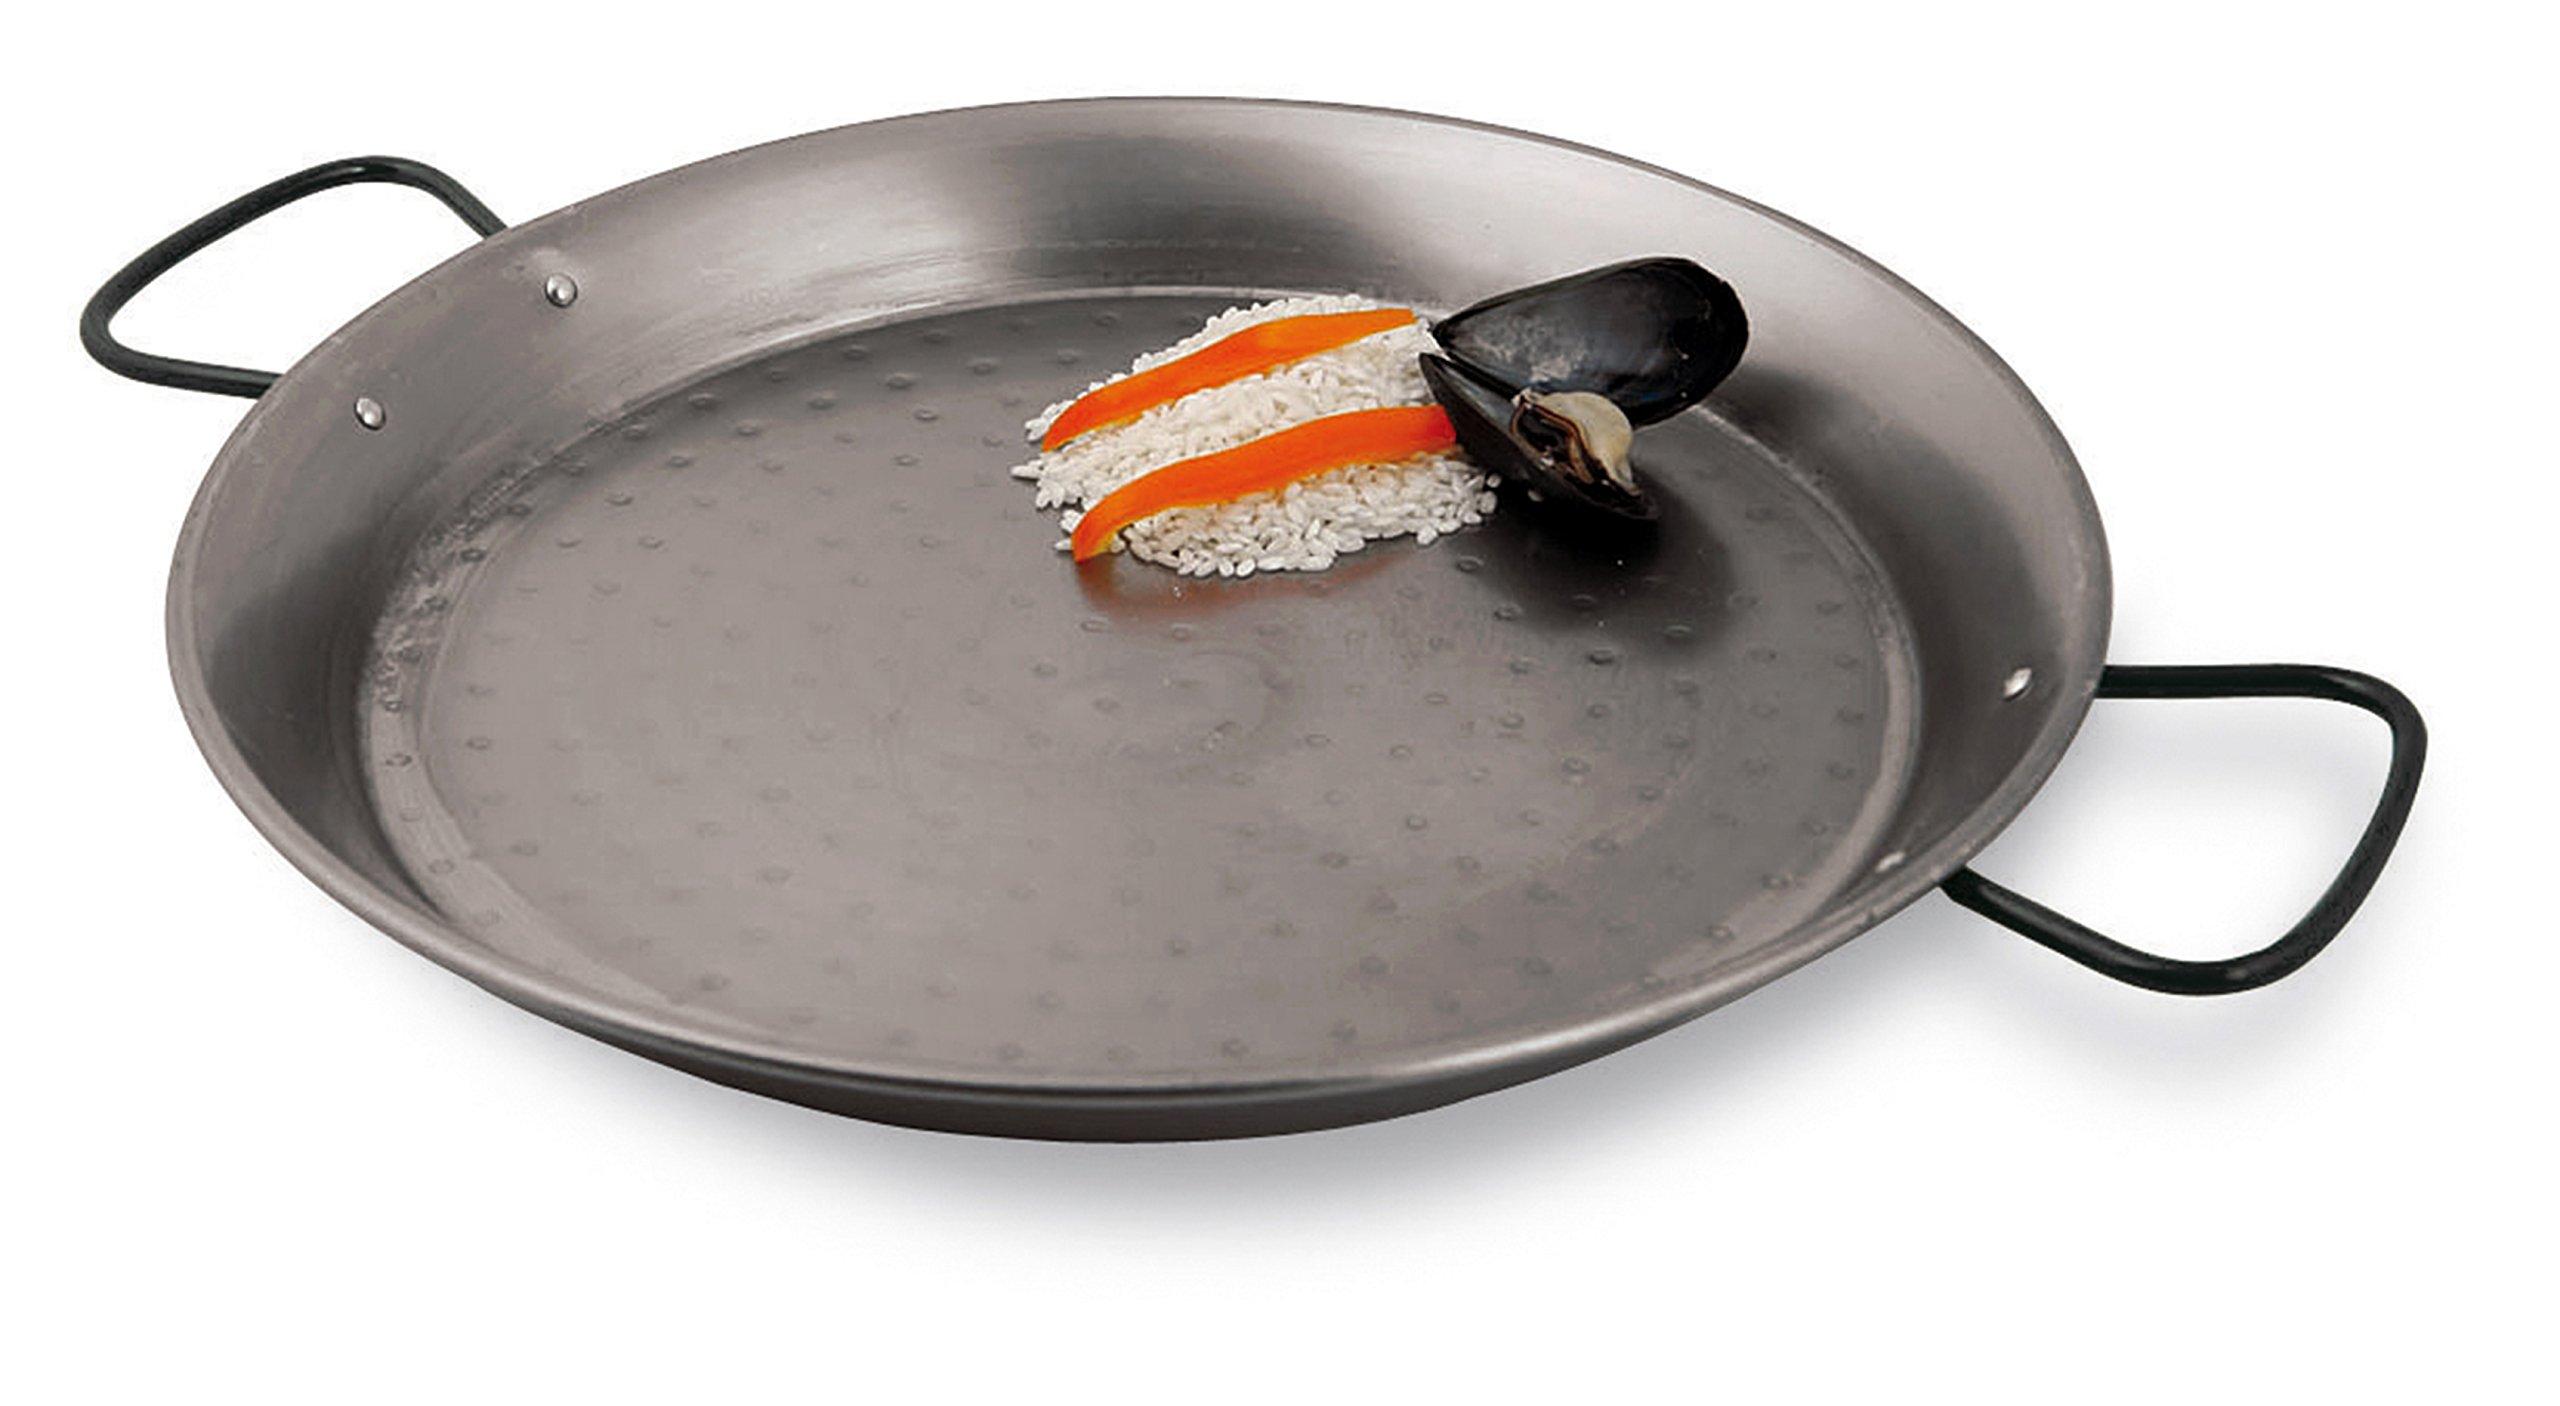 Paderno World Cuisine A4172447 Spanish Paella Pan, 18 1/2in, Gray by Paderno World Cuisine